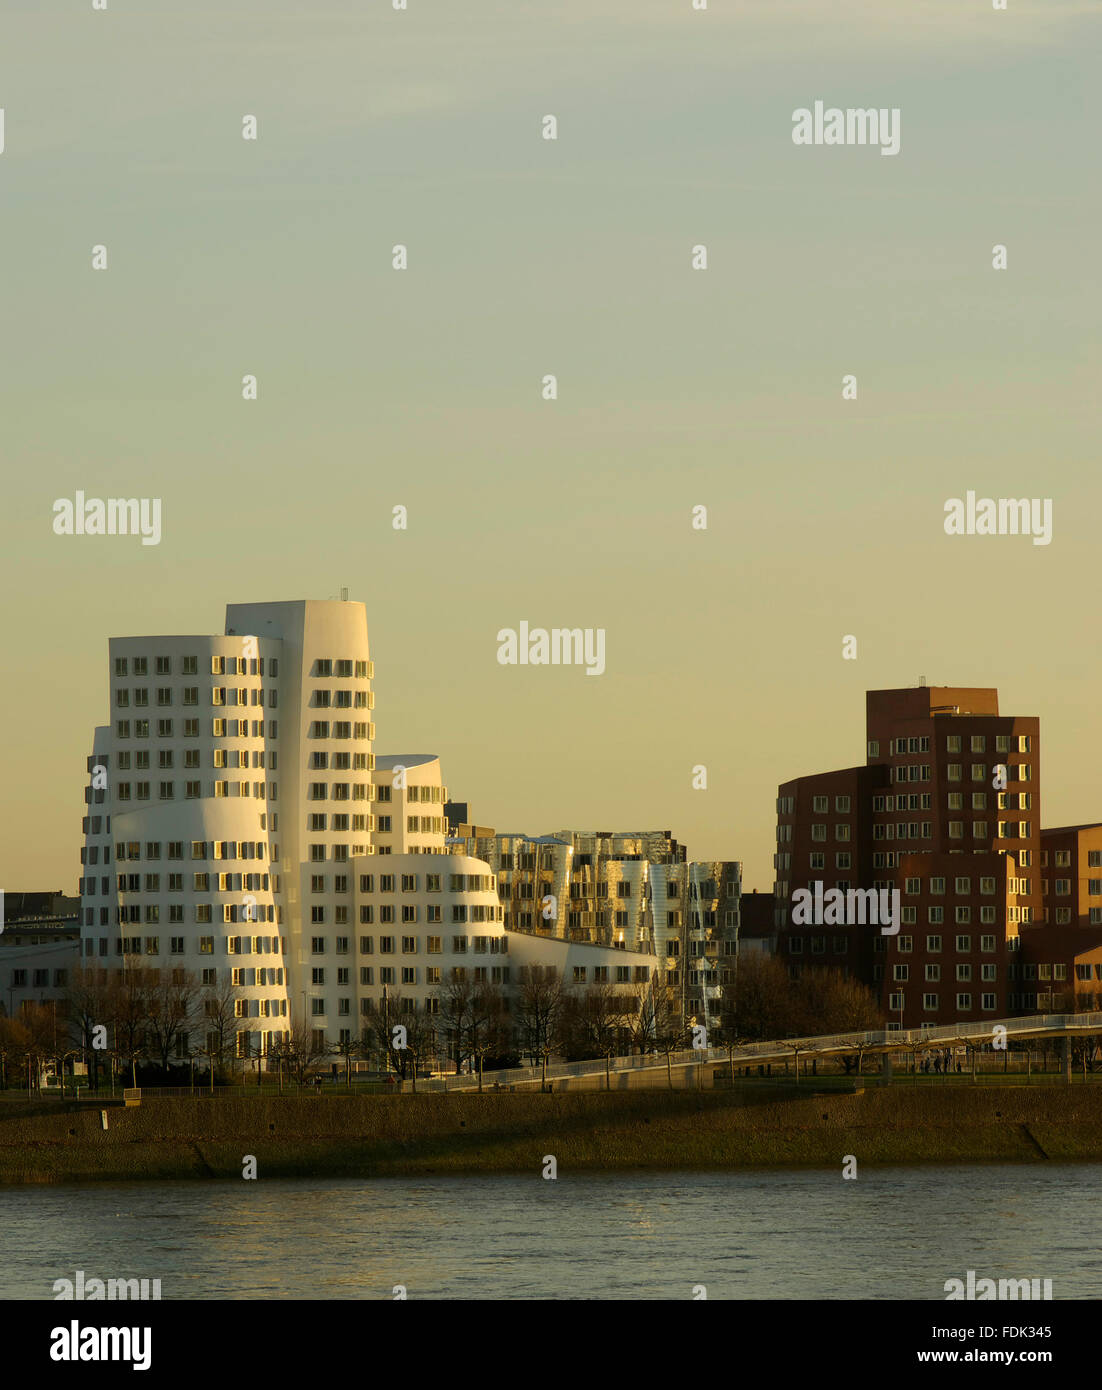 düsseldorf,rhine river,gehryhaus,landtag watersite - Stock Image